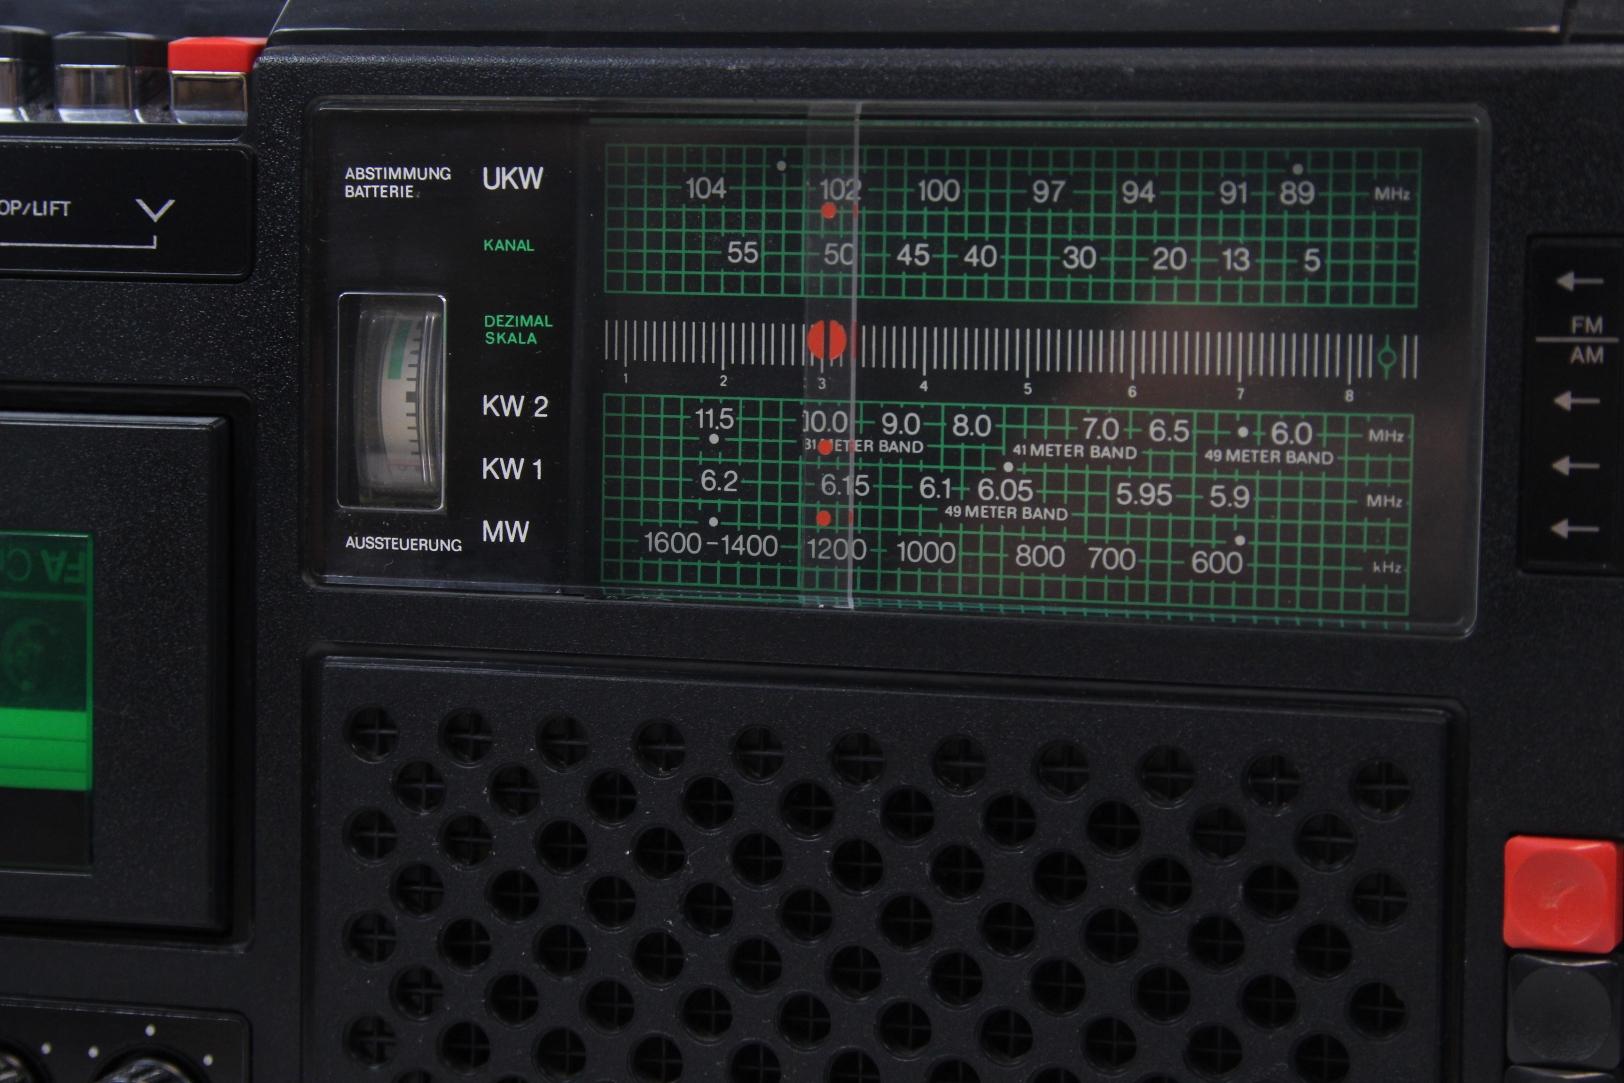 stern r4100 radio radiorecorder rft rundfunkempf nger ddr kassettenradio 2 ebay. Black Bedroom Furniture Sets. Home Design Ideas